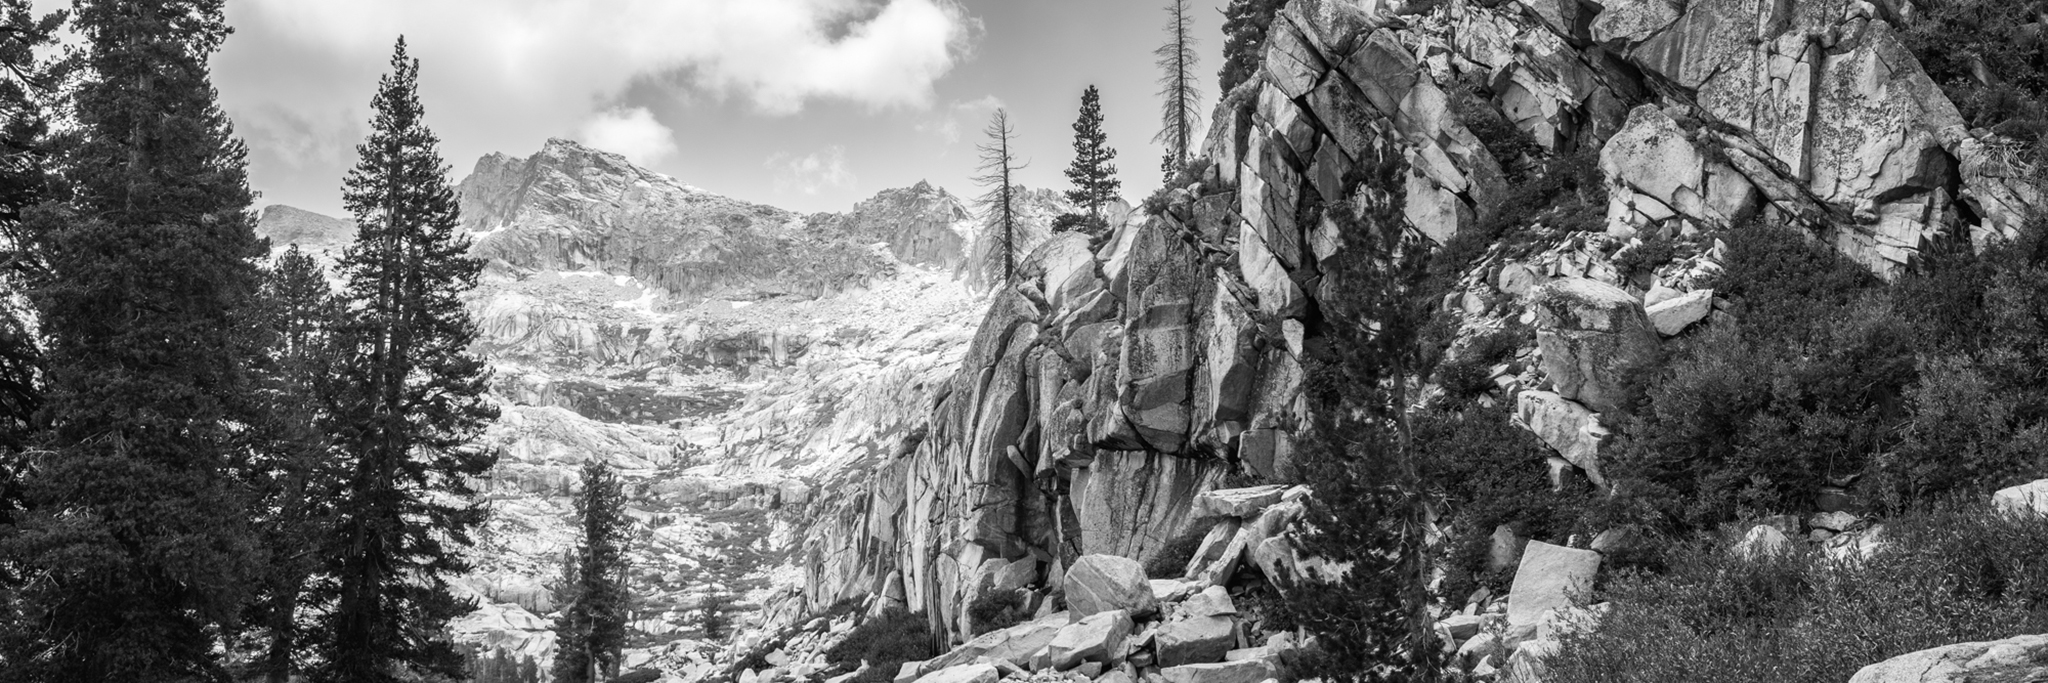 sequoia national park -